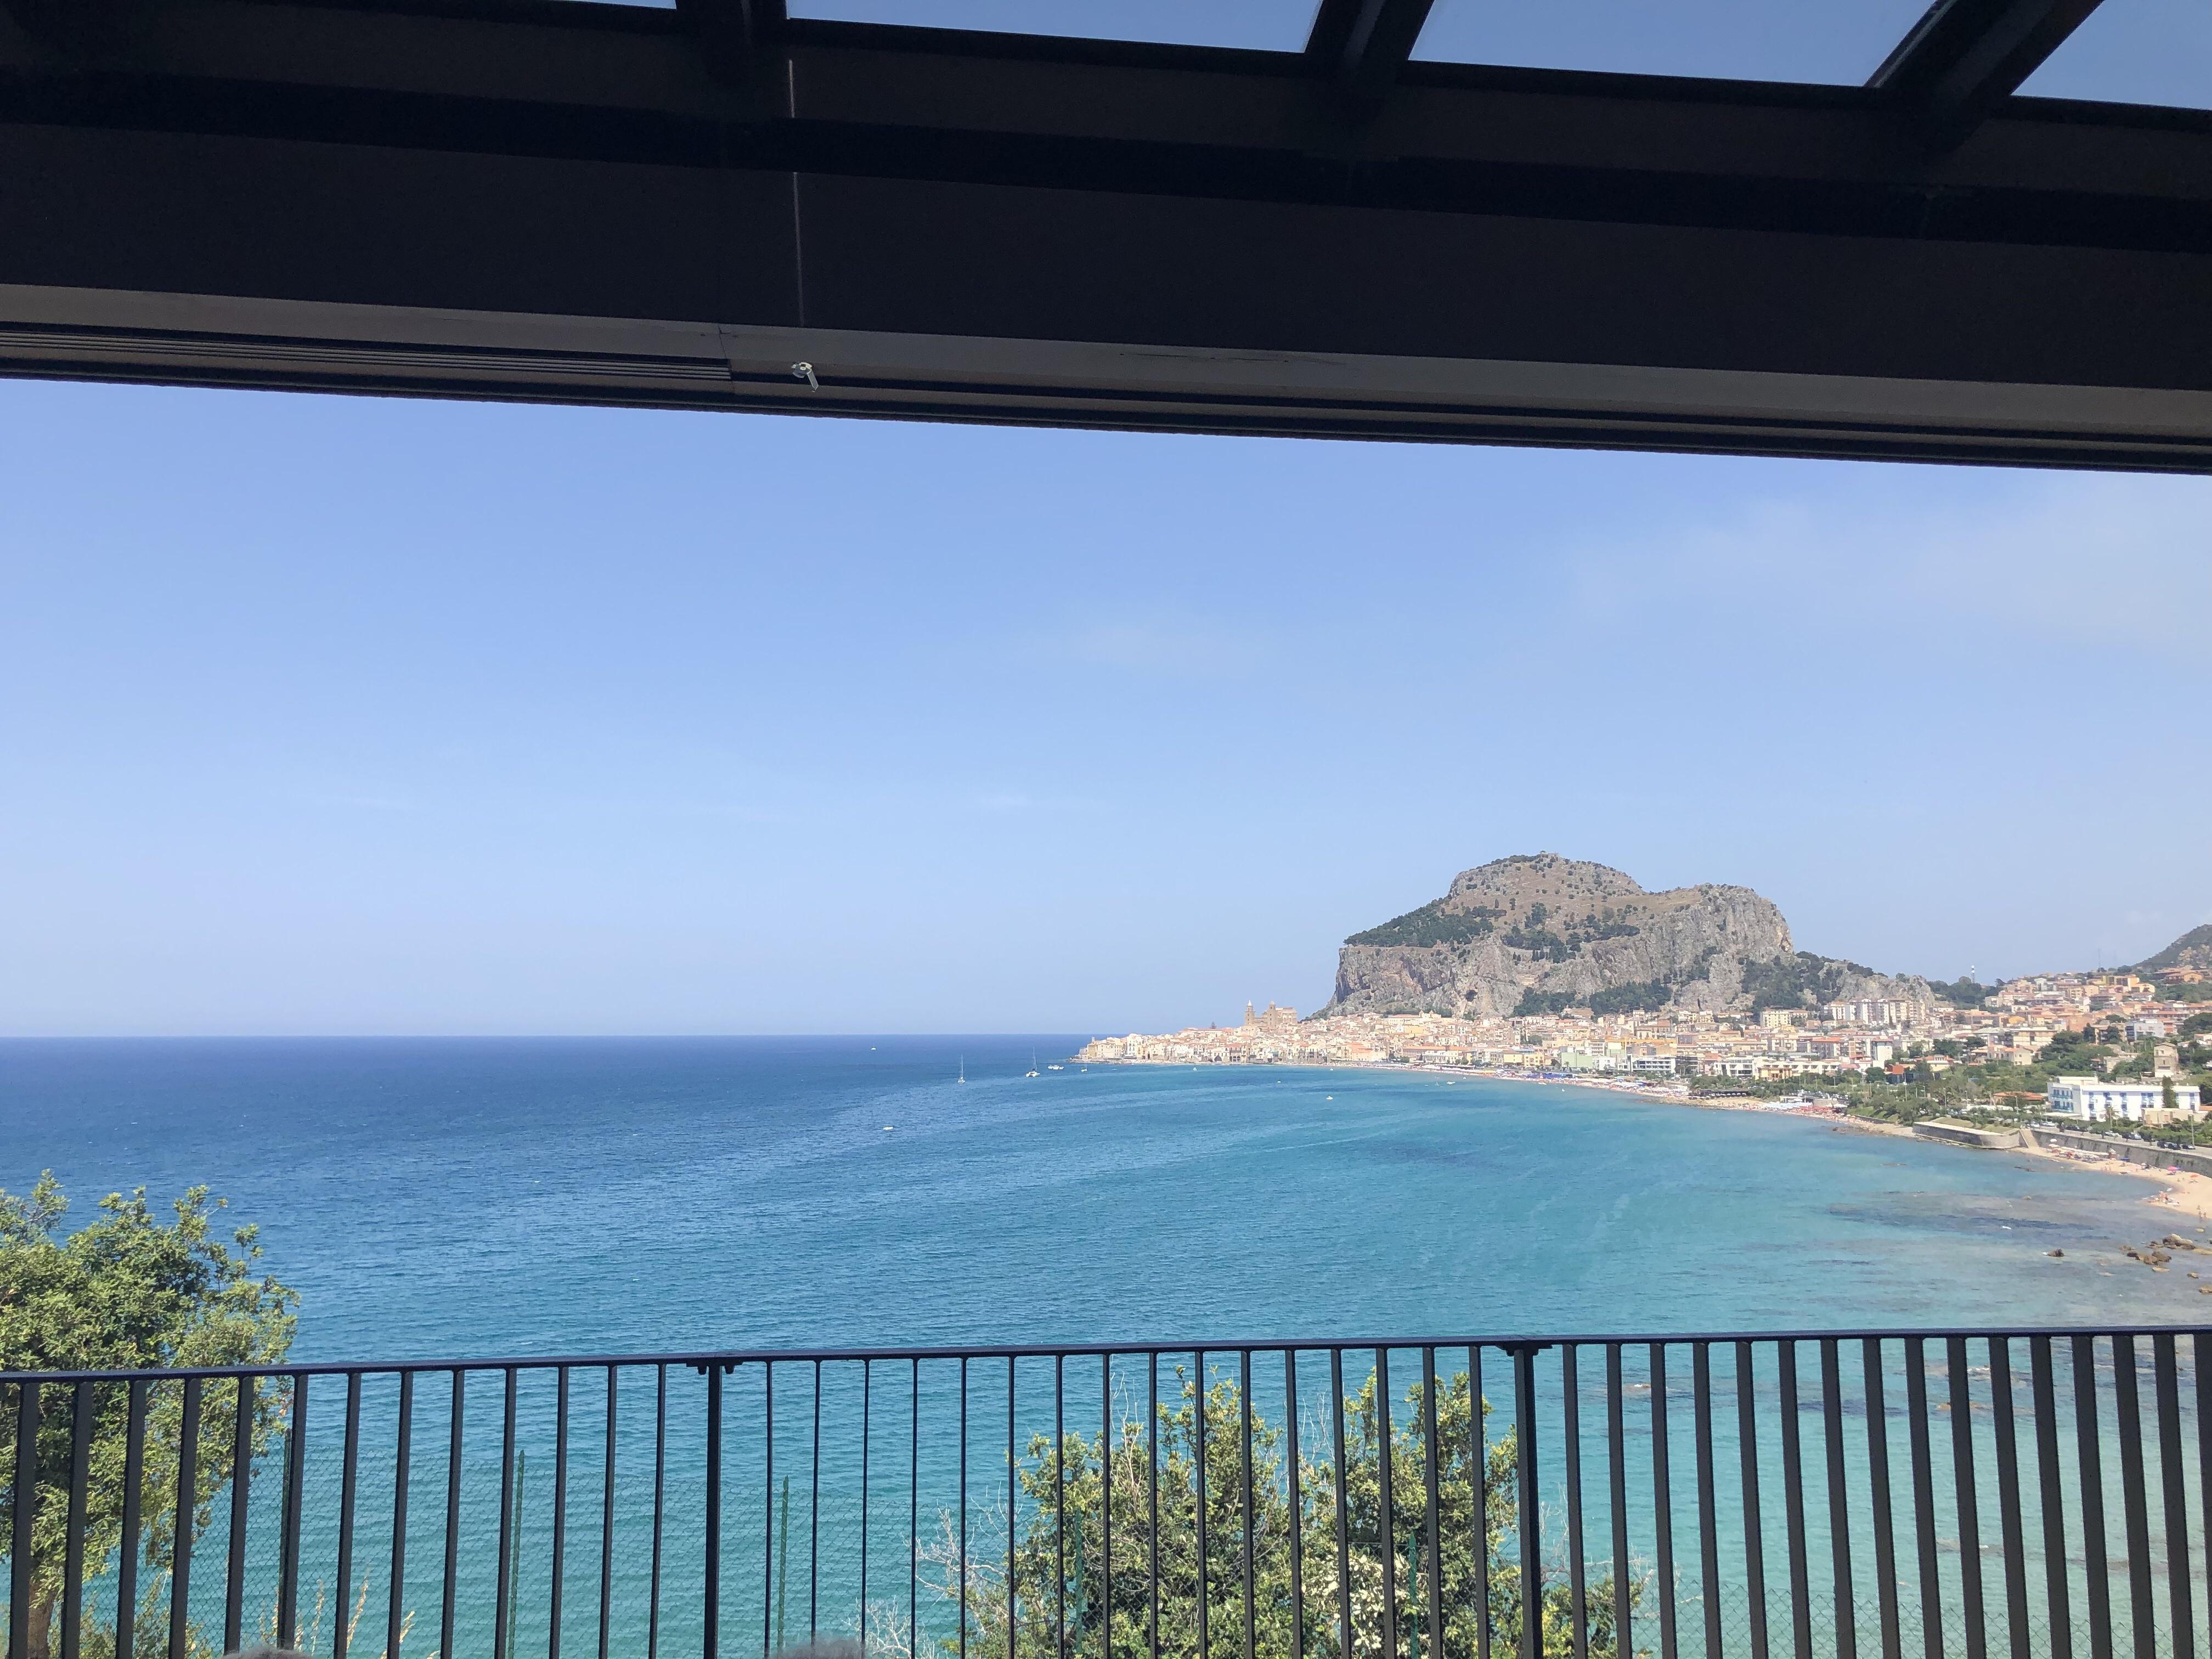 Sicilien, Cefalu, Lata dagar | Andrea Brodin